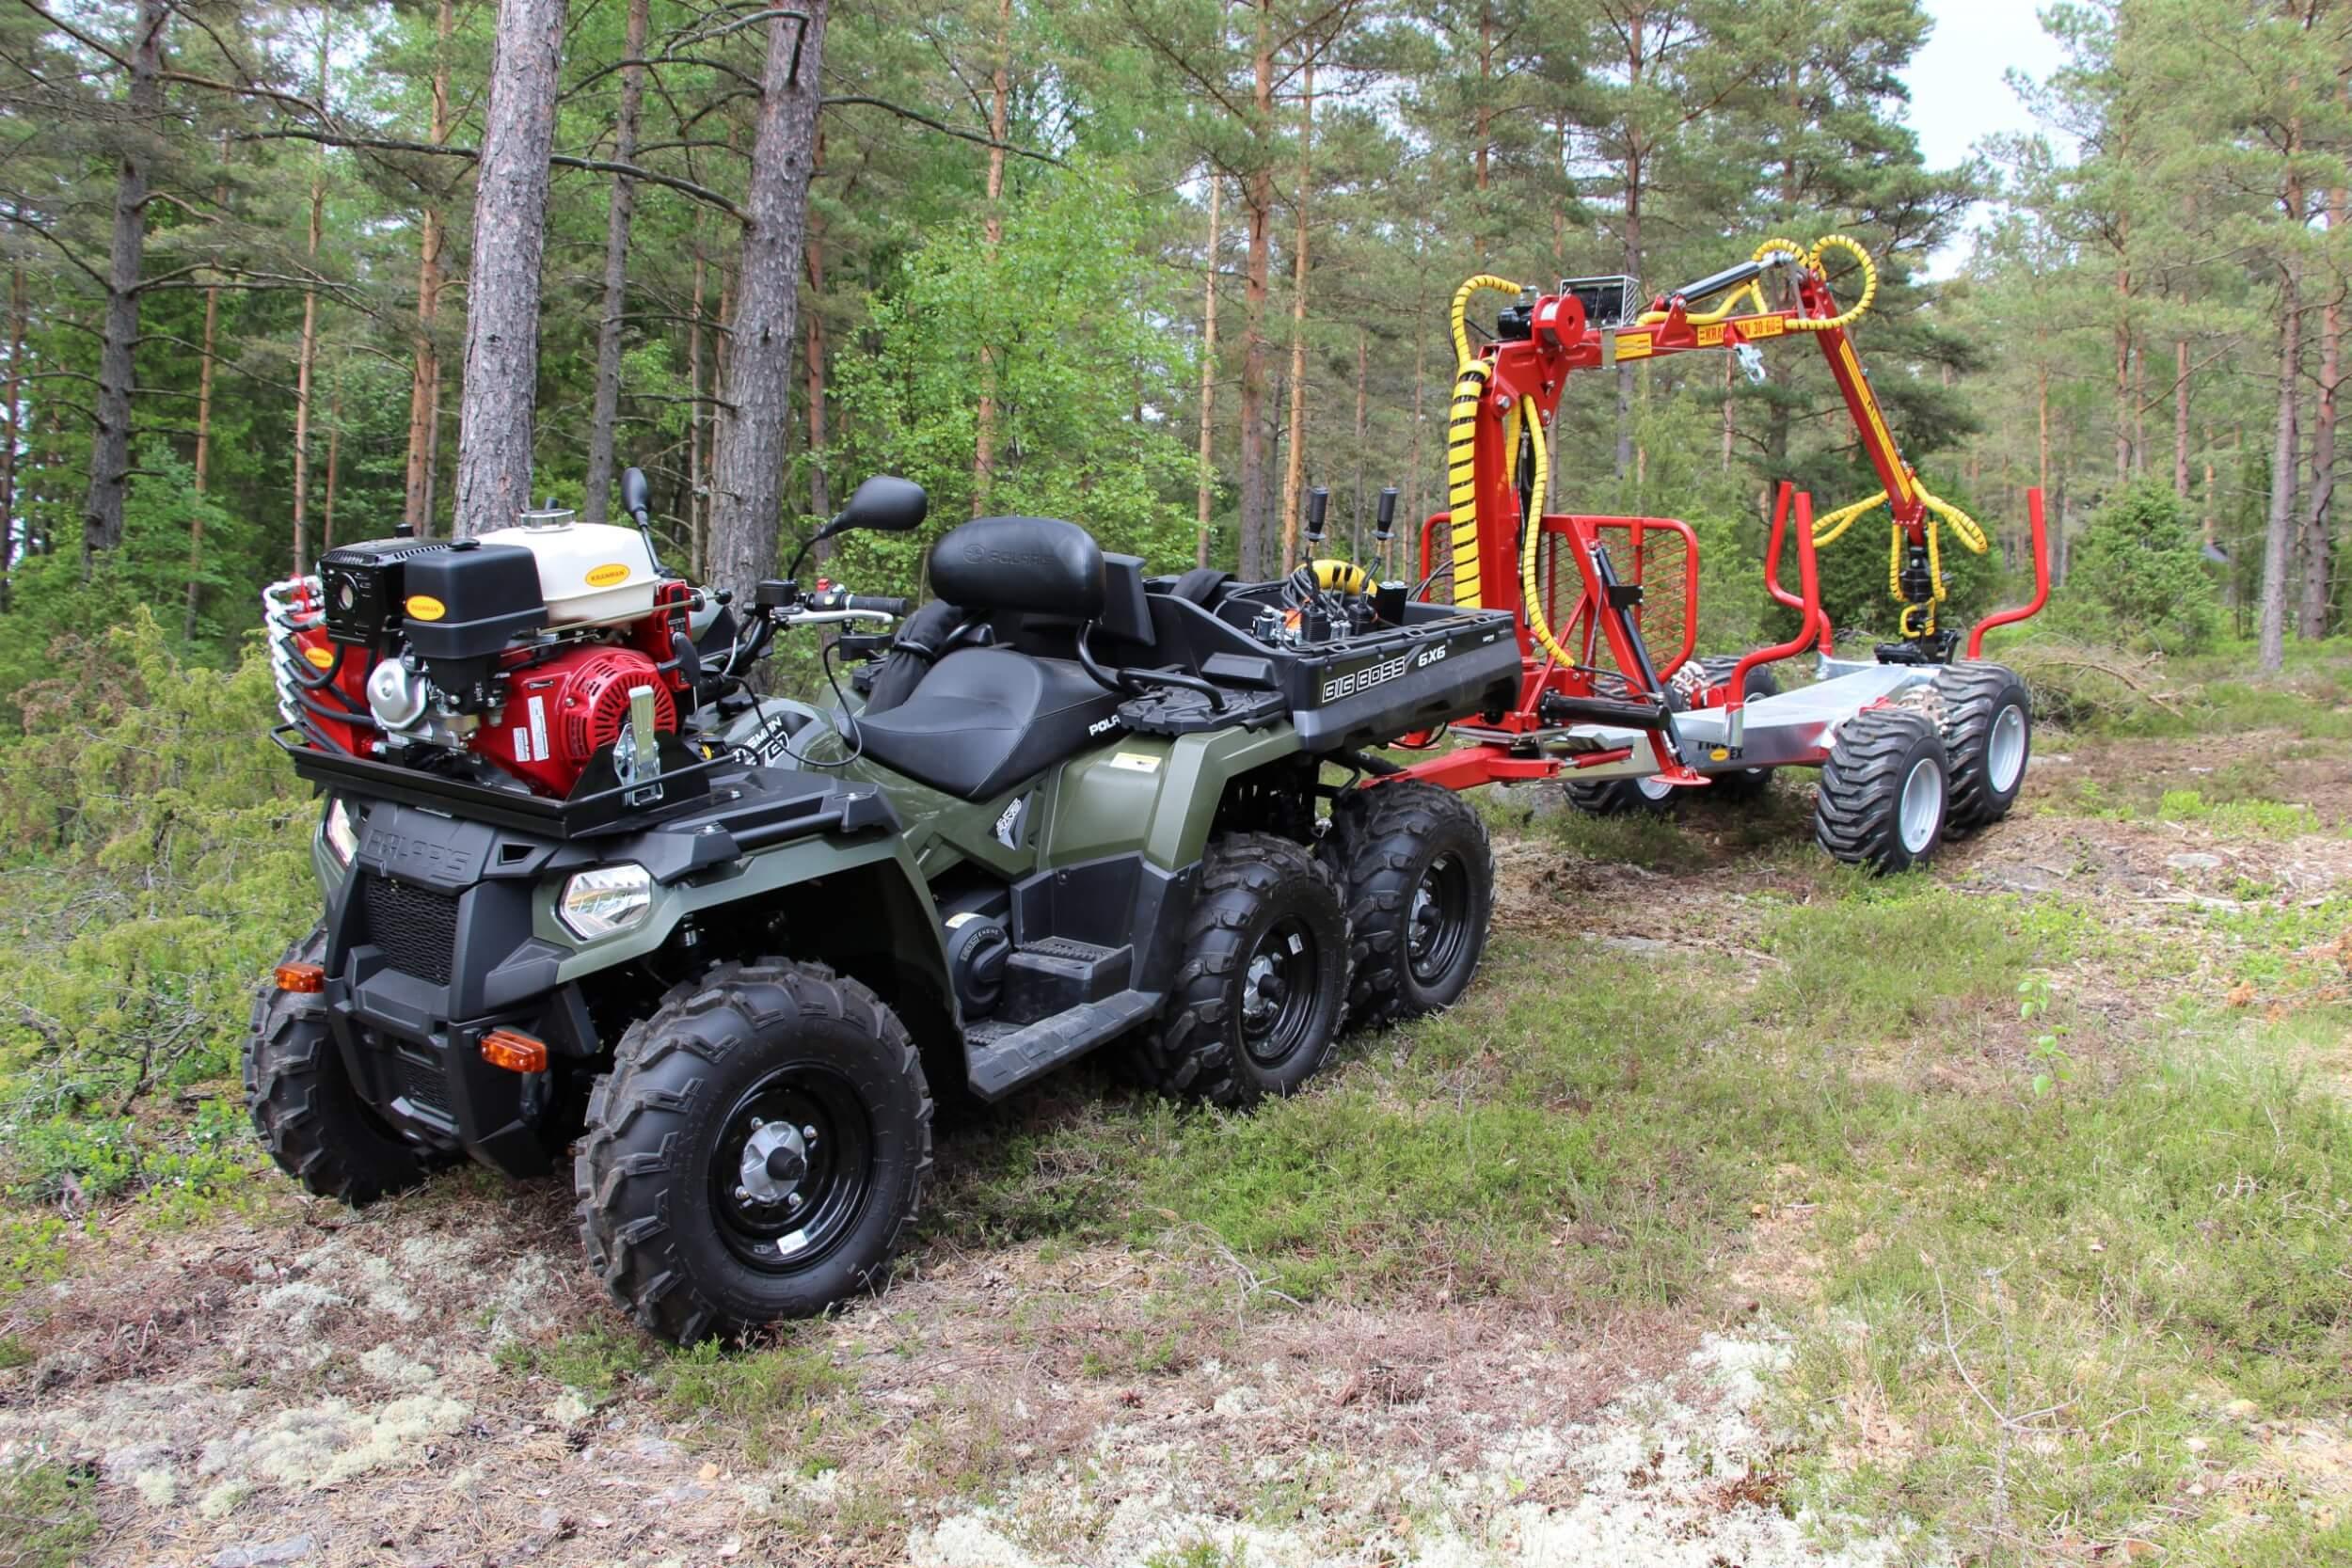 Polaris 6x6 med kranman T1950ex griplastarvagn